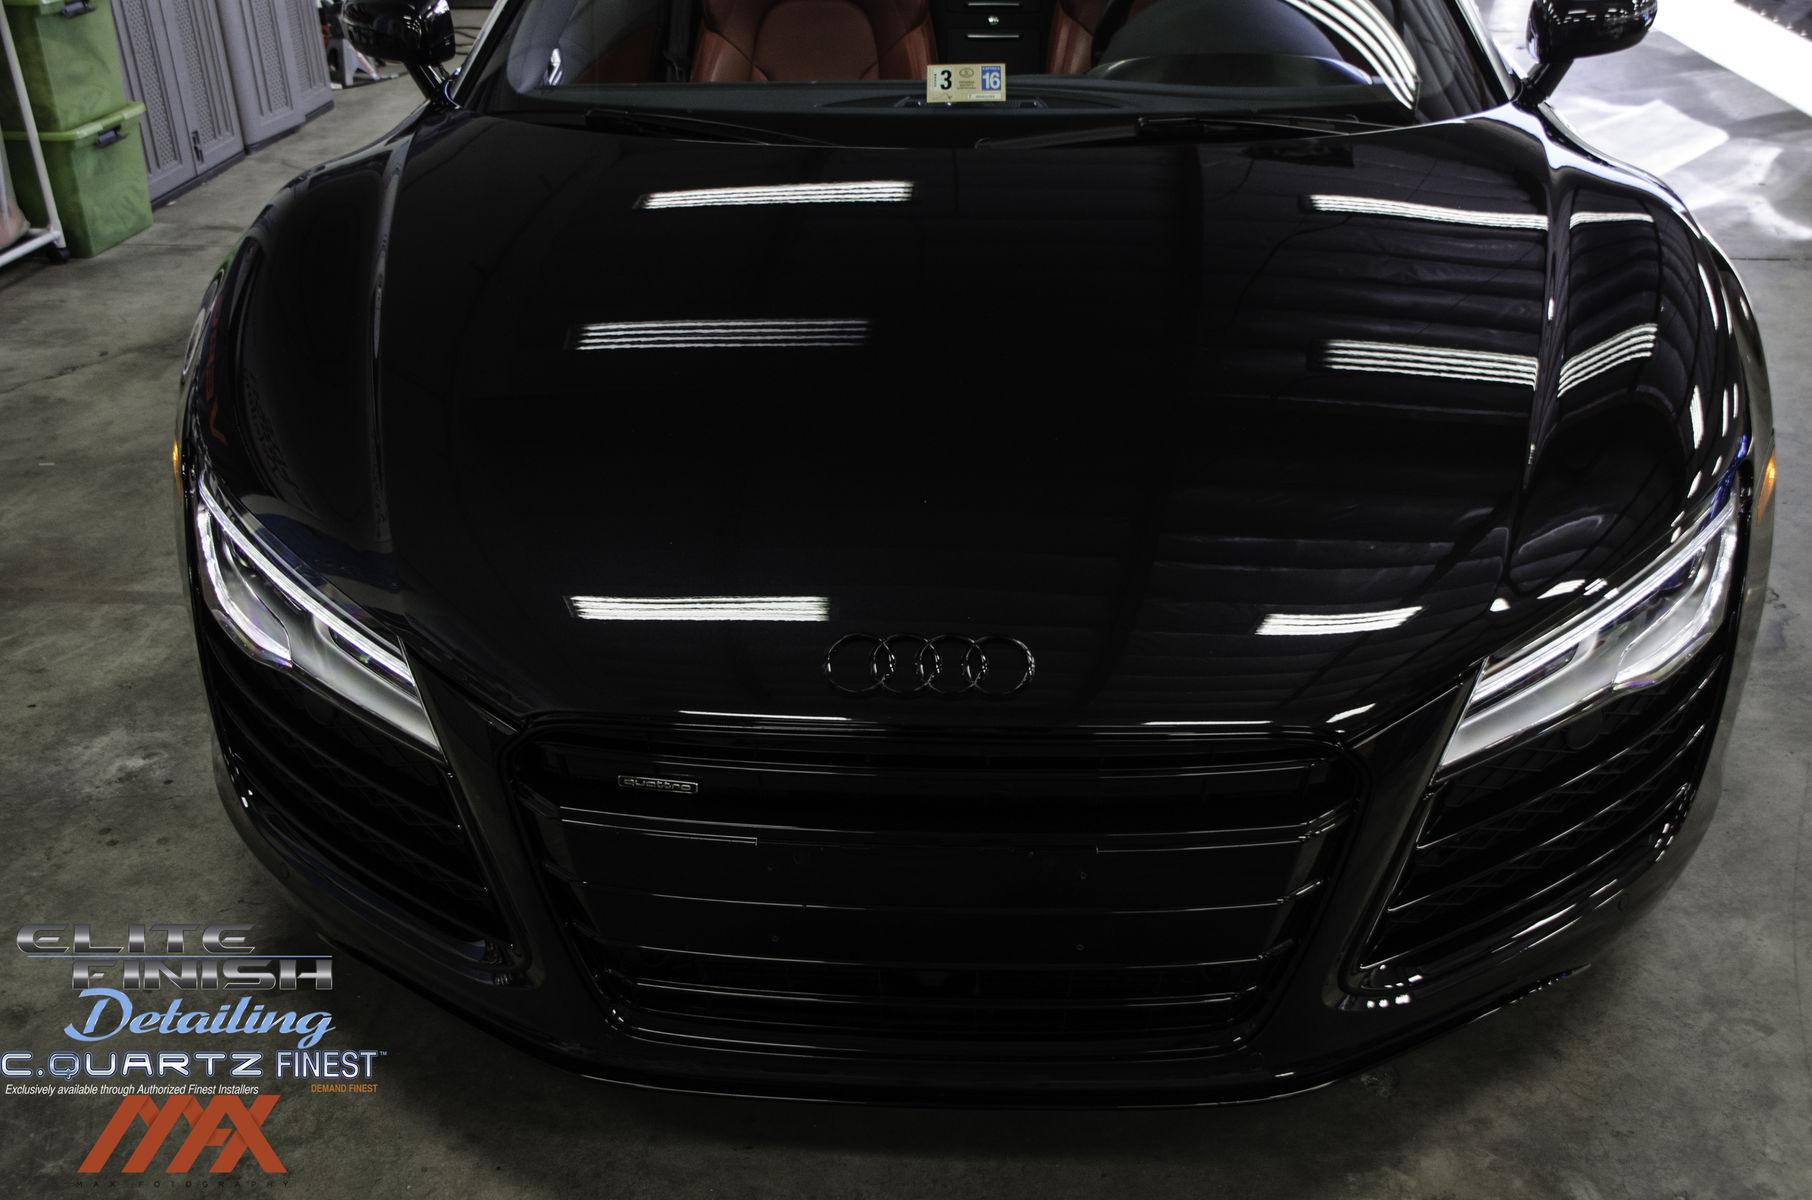 2015 Audi R8 | 2015 Audi R8 V10 Convertible